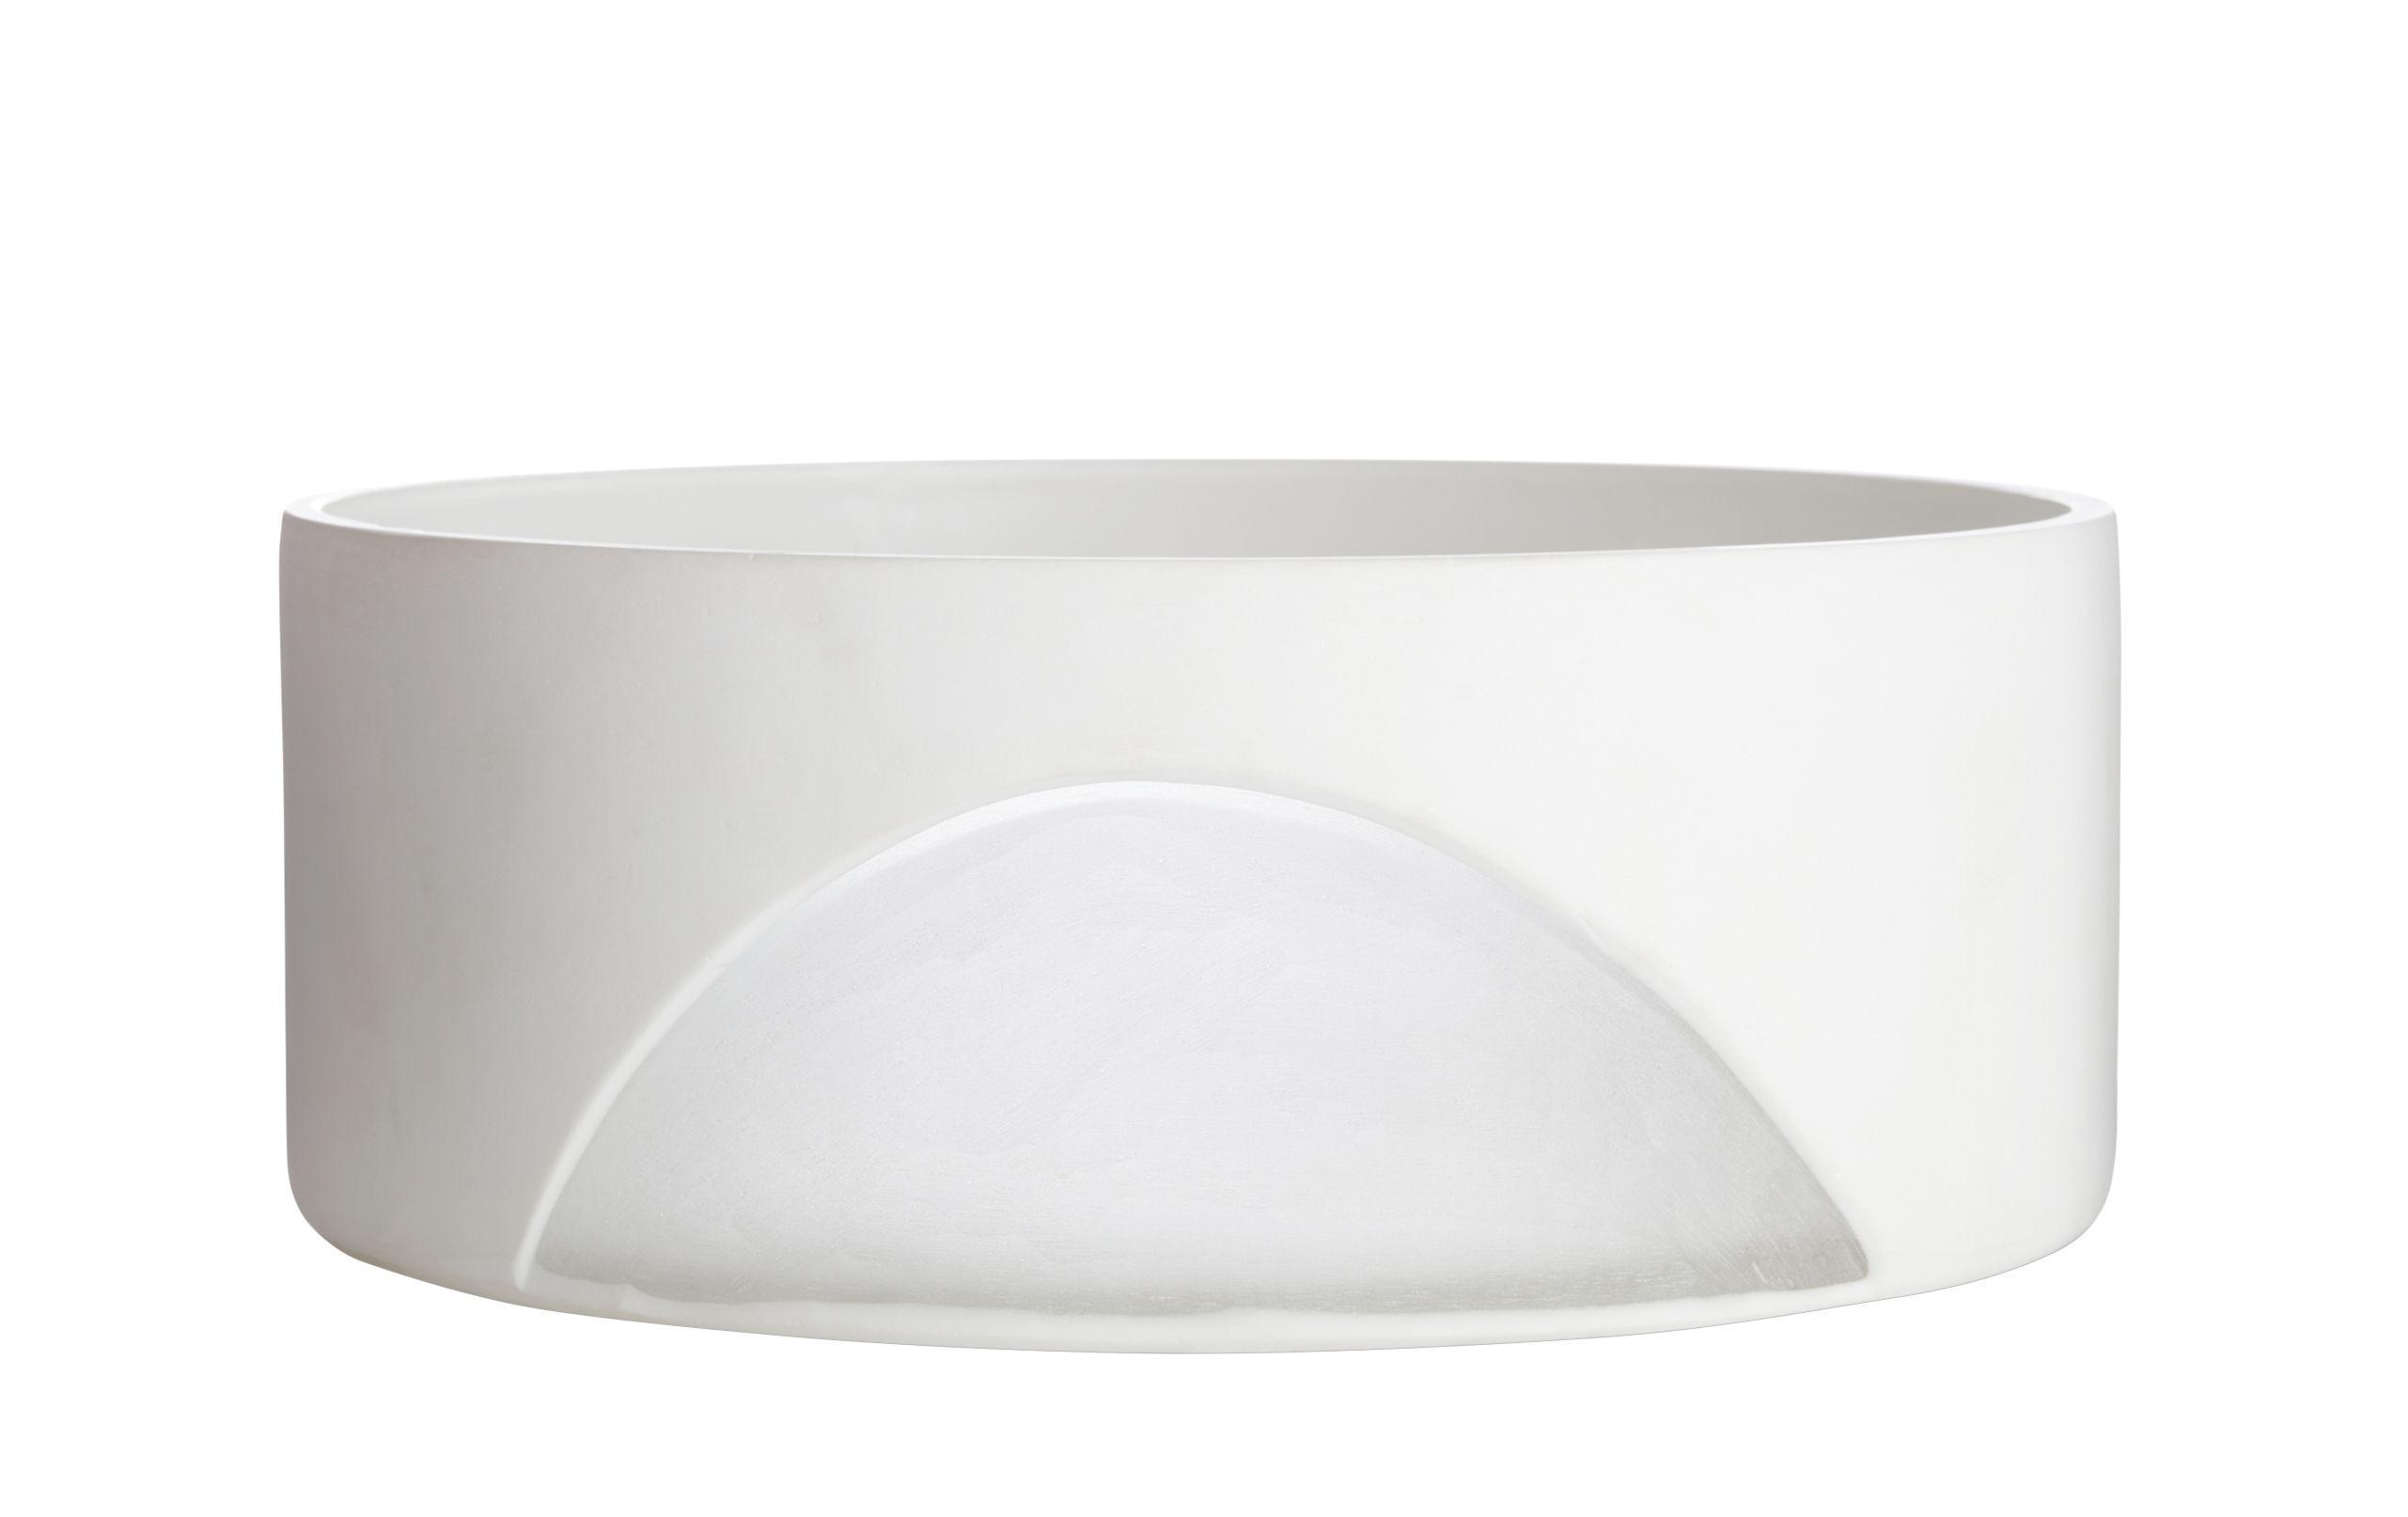 Tableware - Bowls - Carved Bowl - / Ø 28 cm - Blown glass by Tom Dixon - White - Mouth blown glass